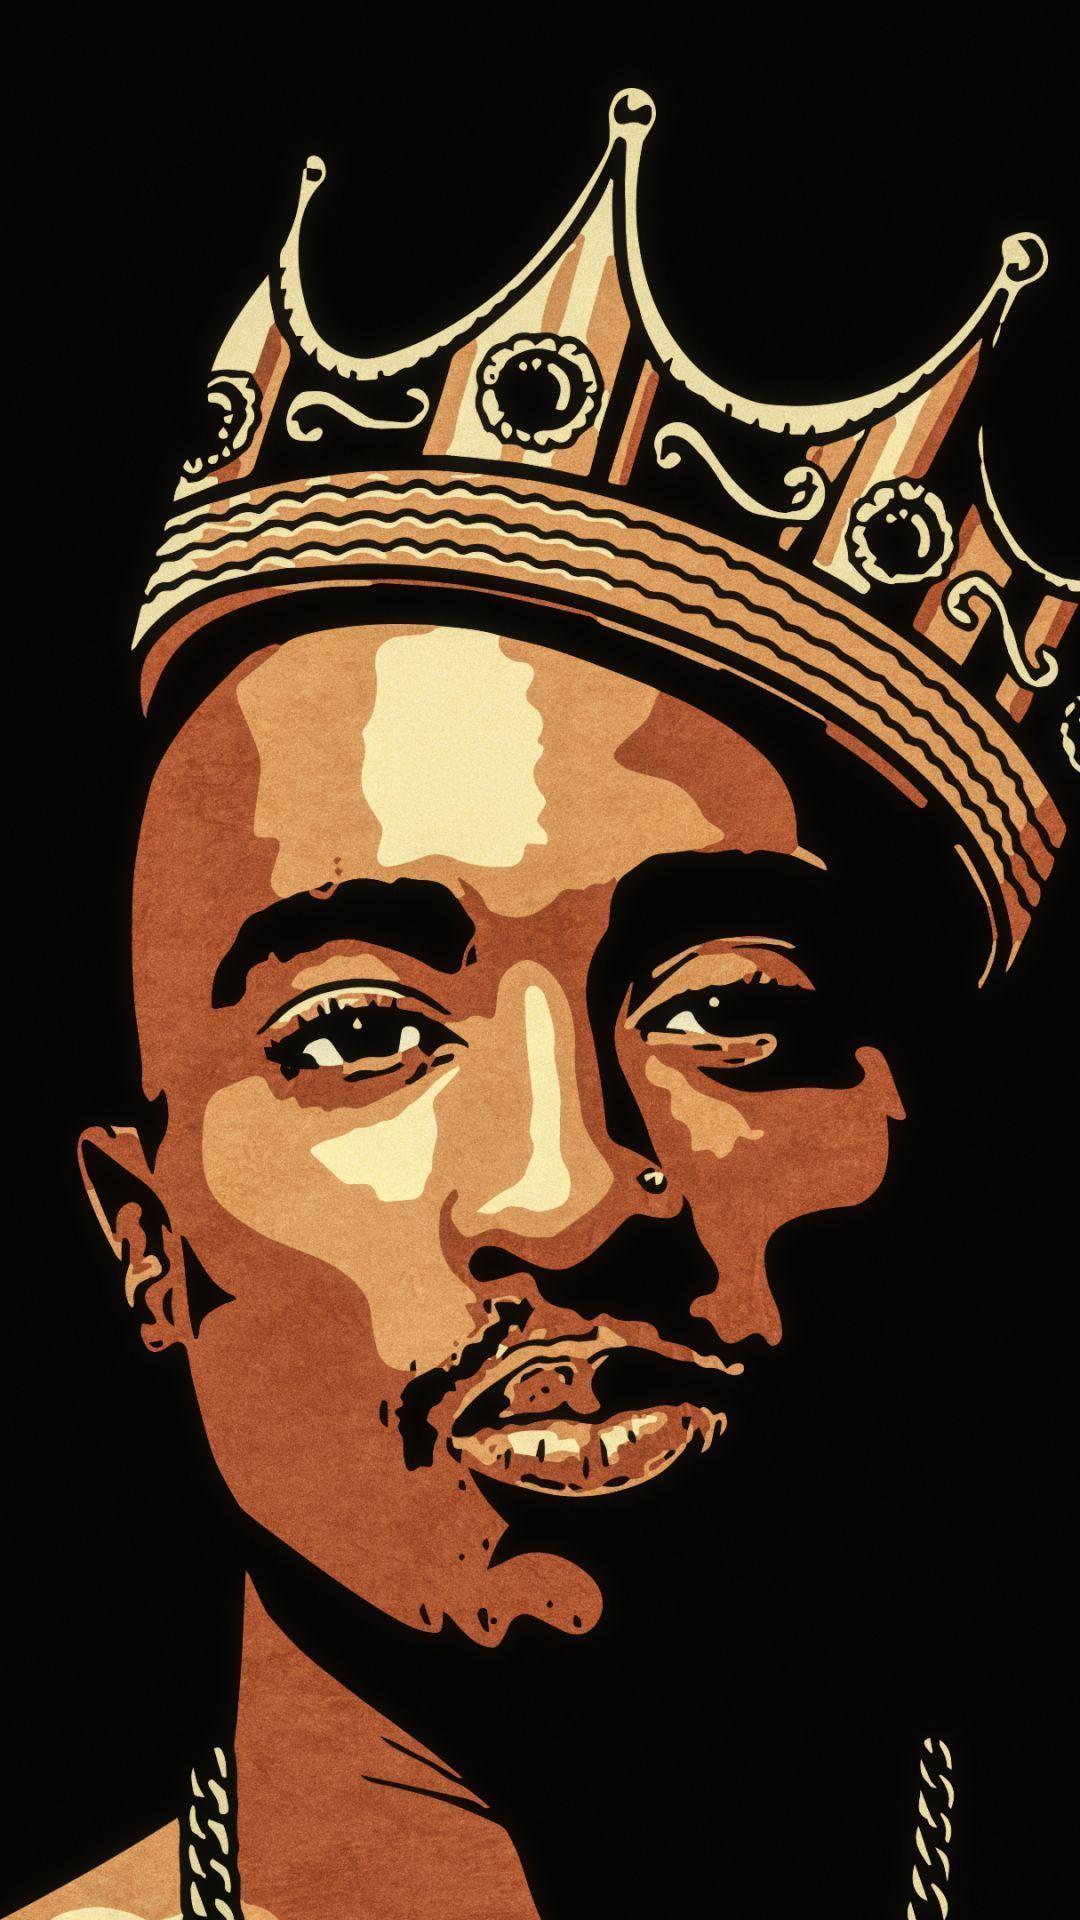 Lbcloomis Wallpaper Hd New Wallpaper Cartoon Wallpaper Tupac Shakur Rapper Art Tupac Art 2pac Art